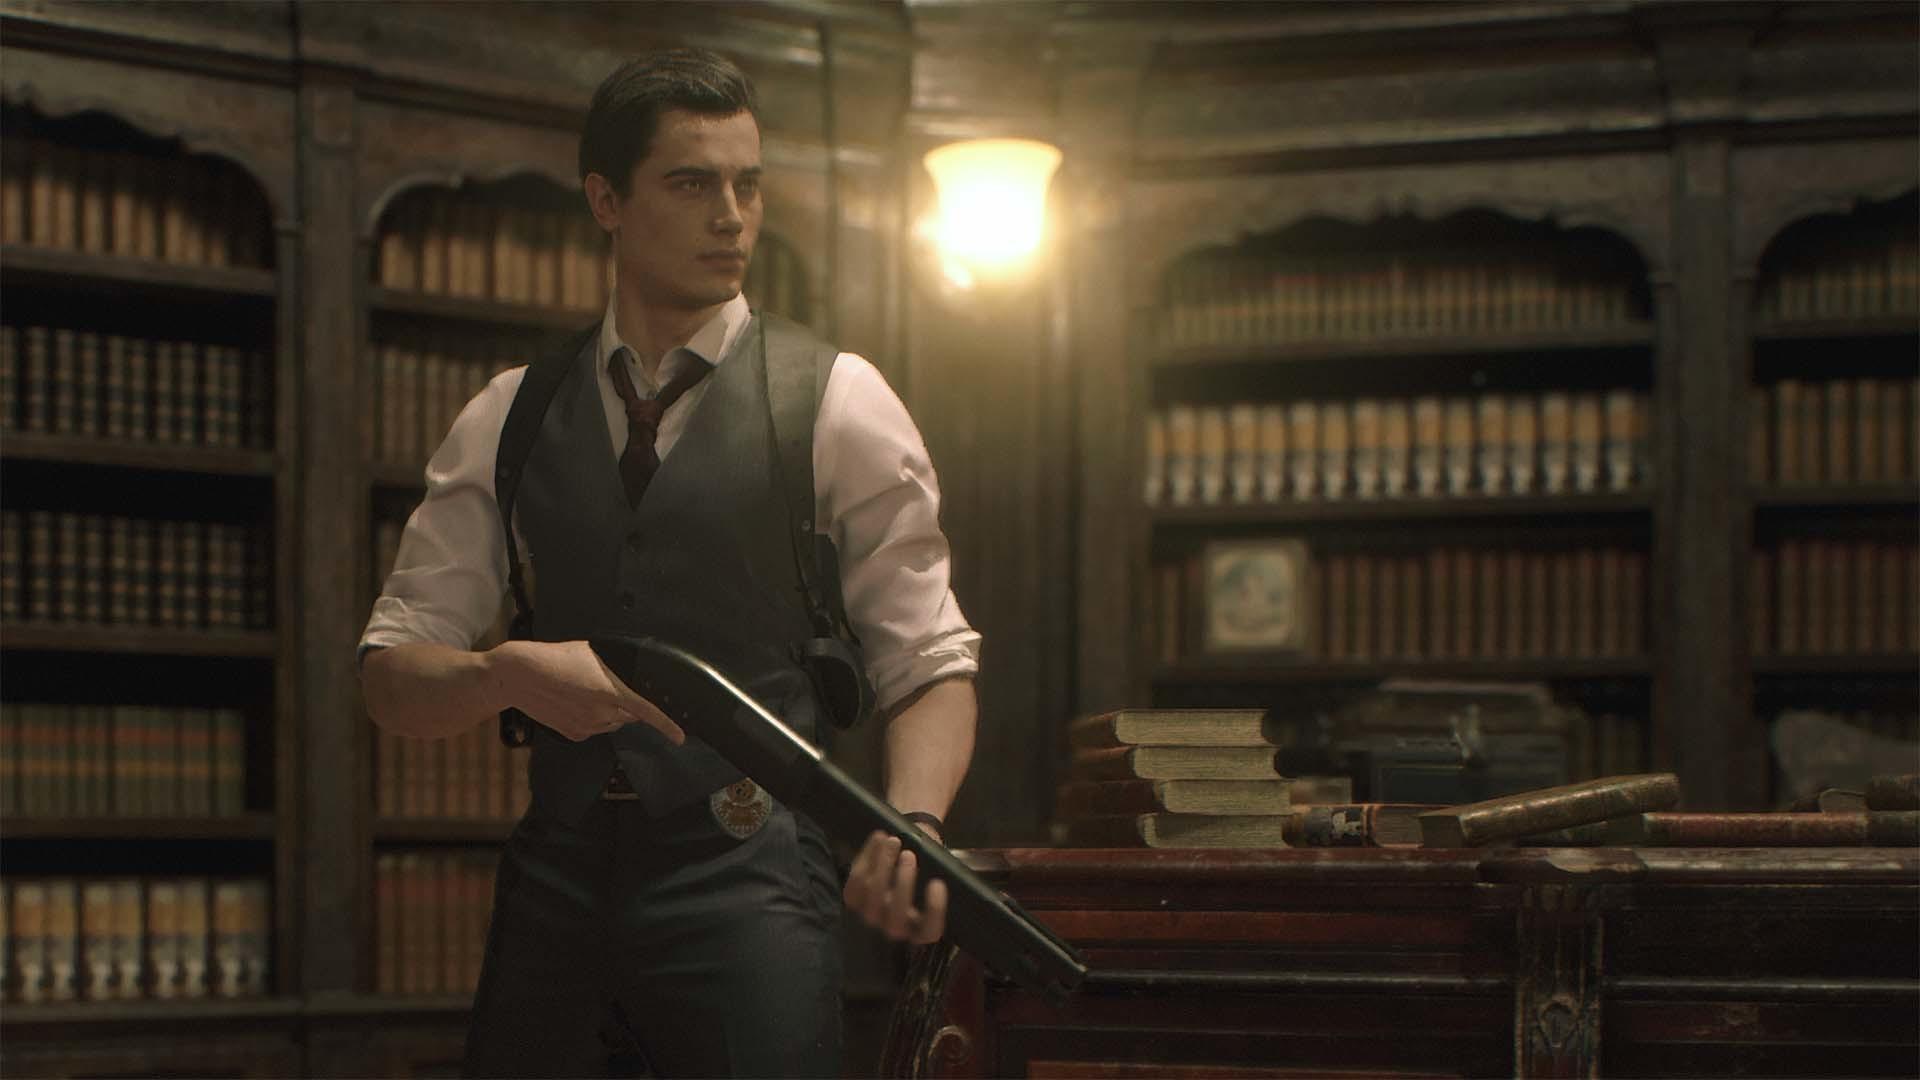 Resident Evil 2 станет похожа на нуар детектив в Deluxe издании - Resident Evil 2